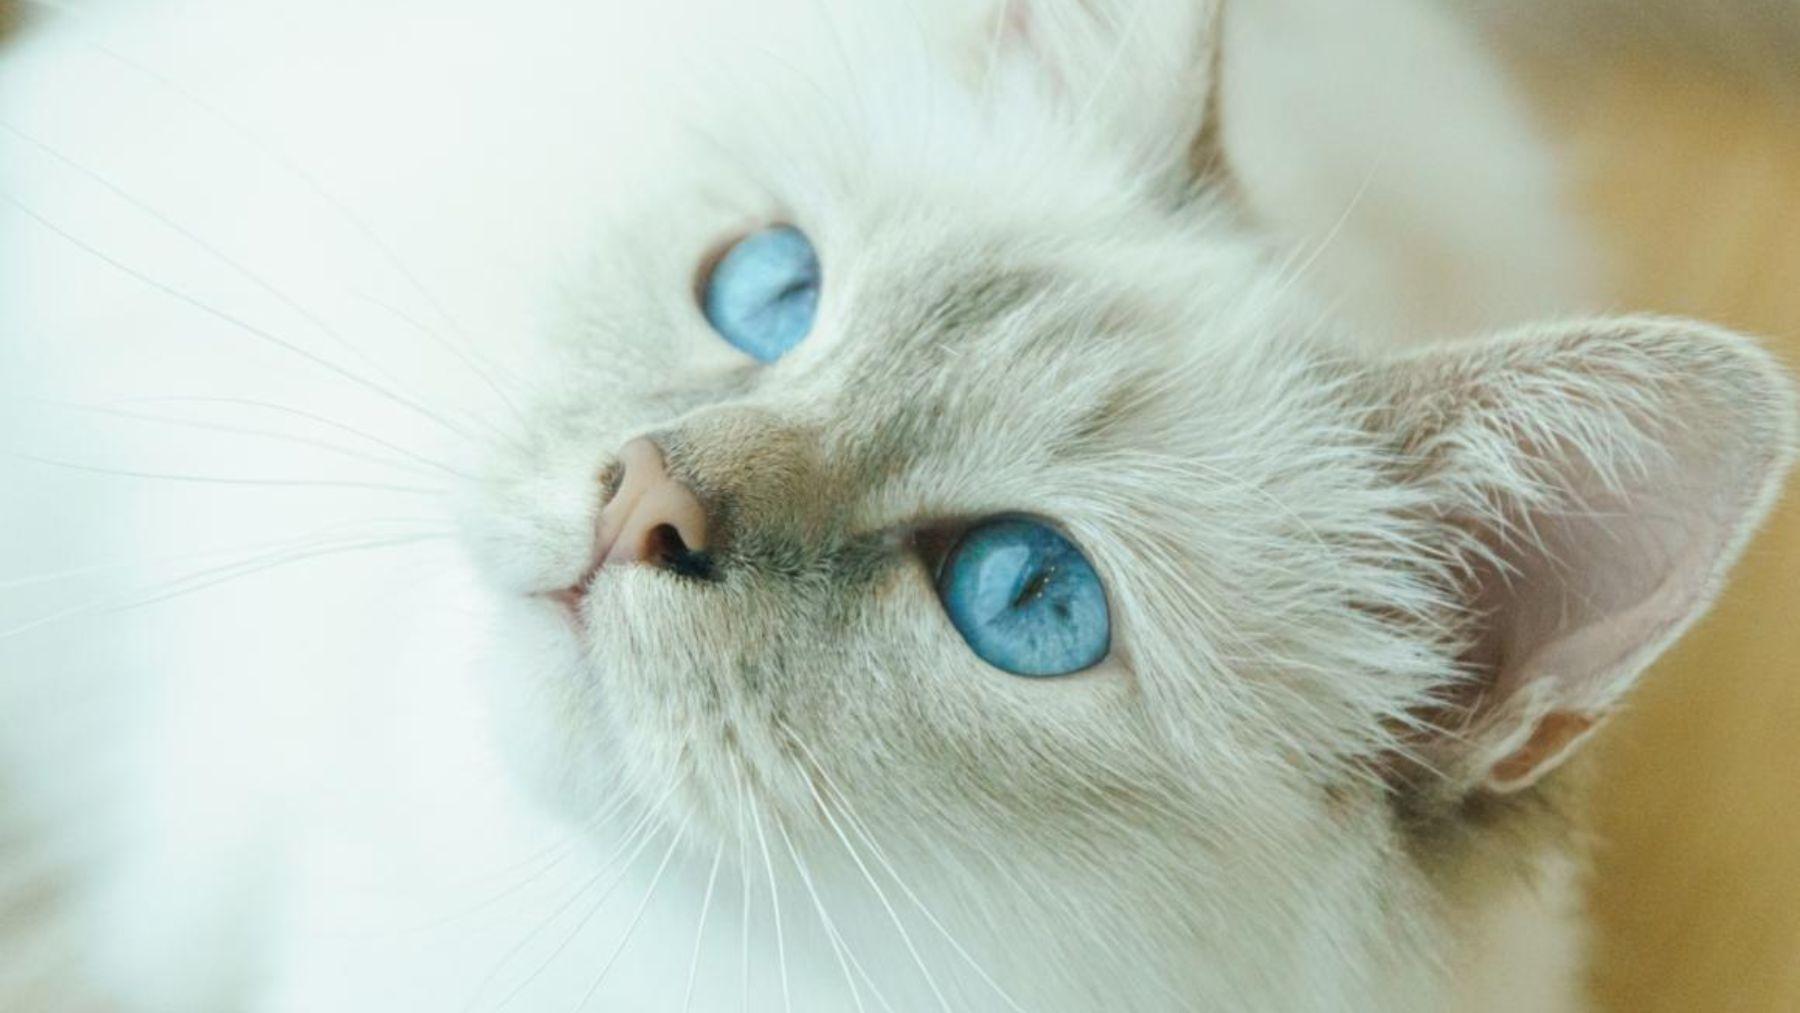 Descubre porqué los gatos blancos de ojos azules suelen ser sordos